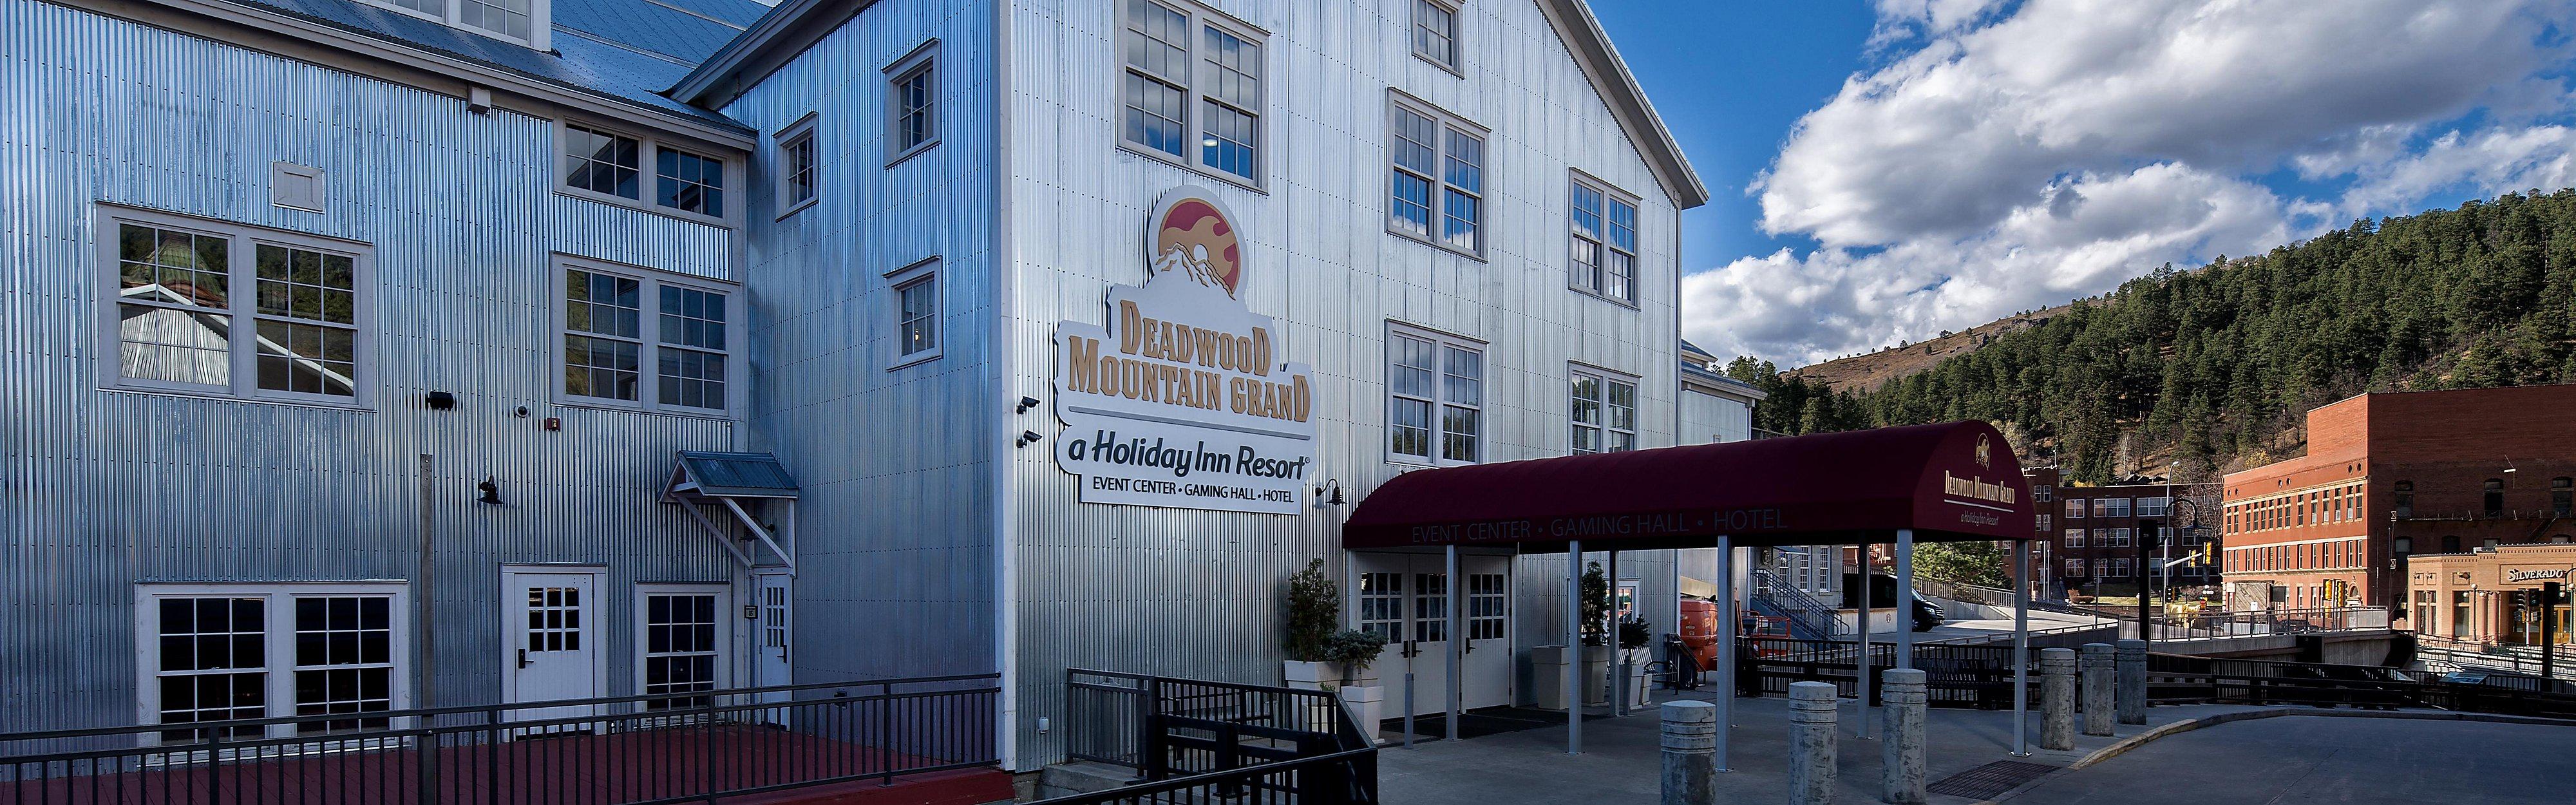 Holiday Inn Resort Deadwood Mountain Grand Hotel by IHG on